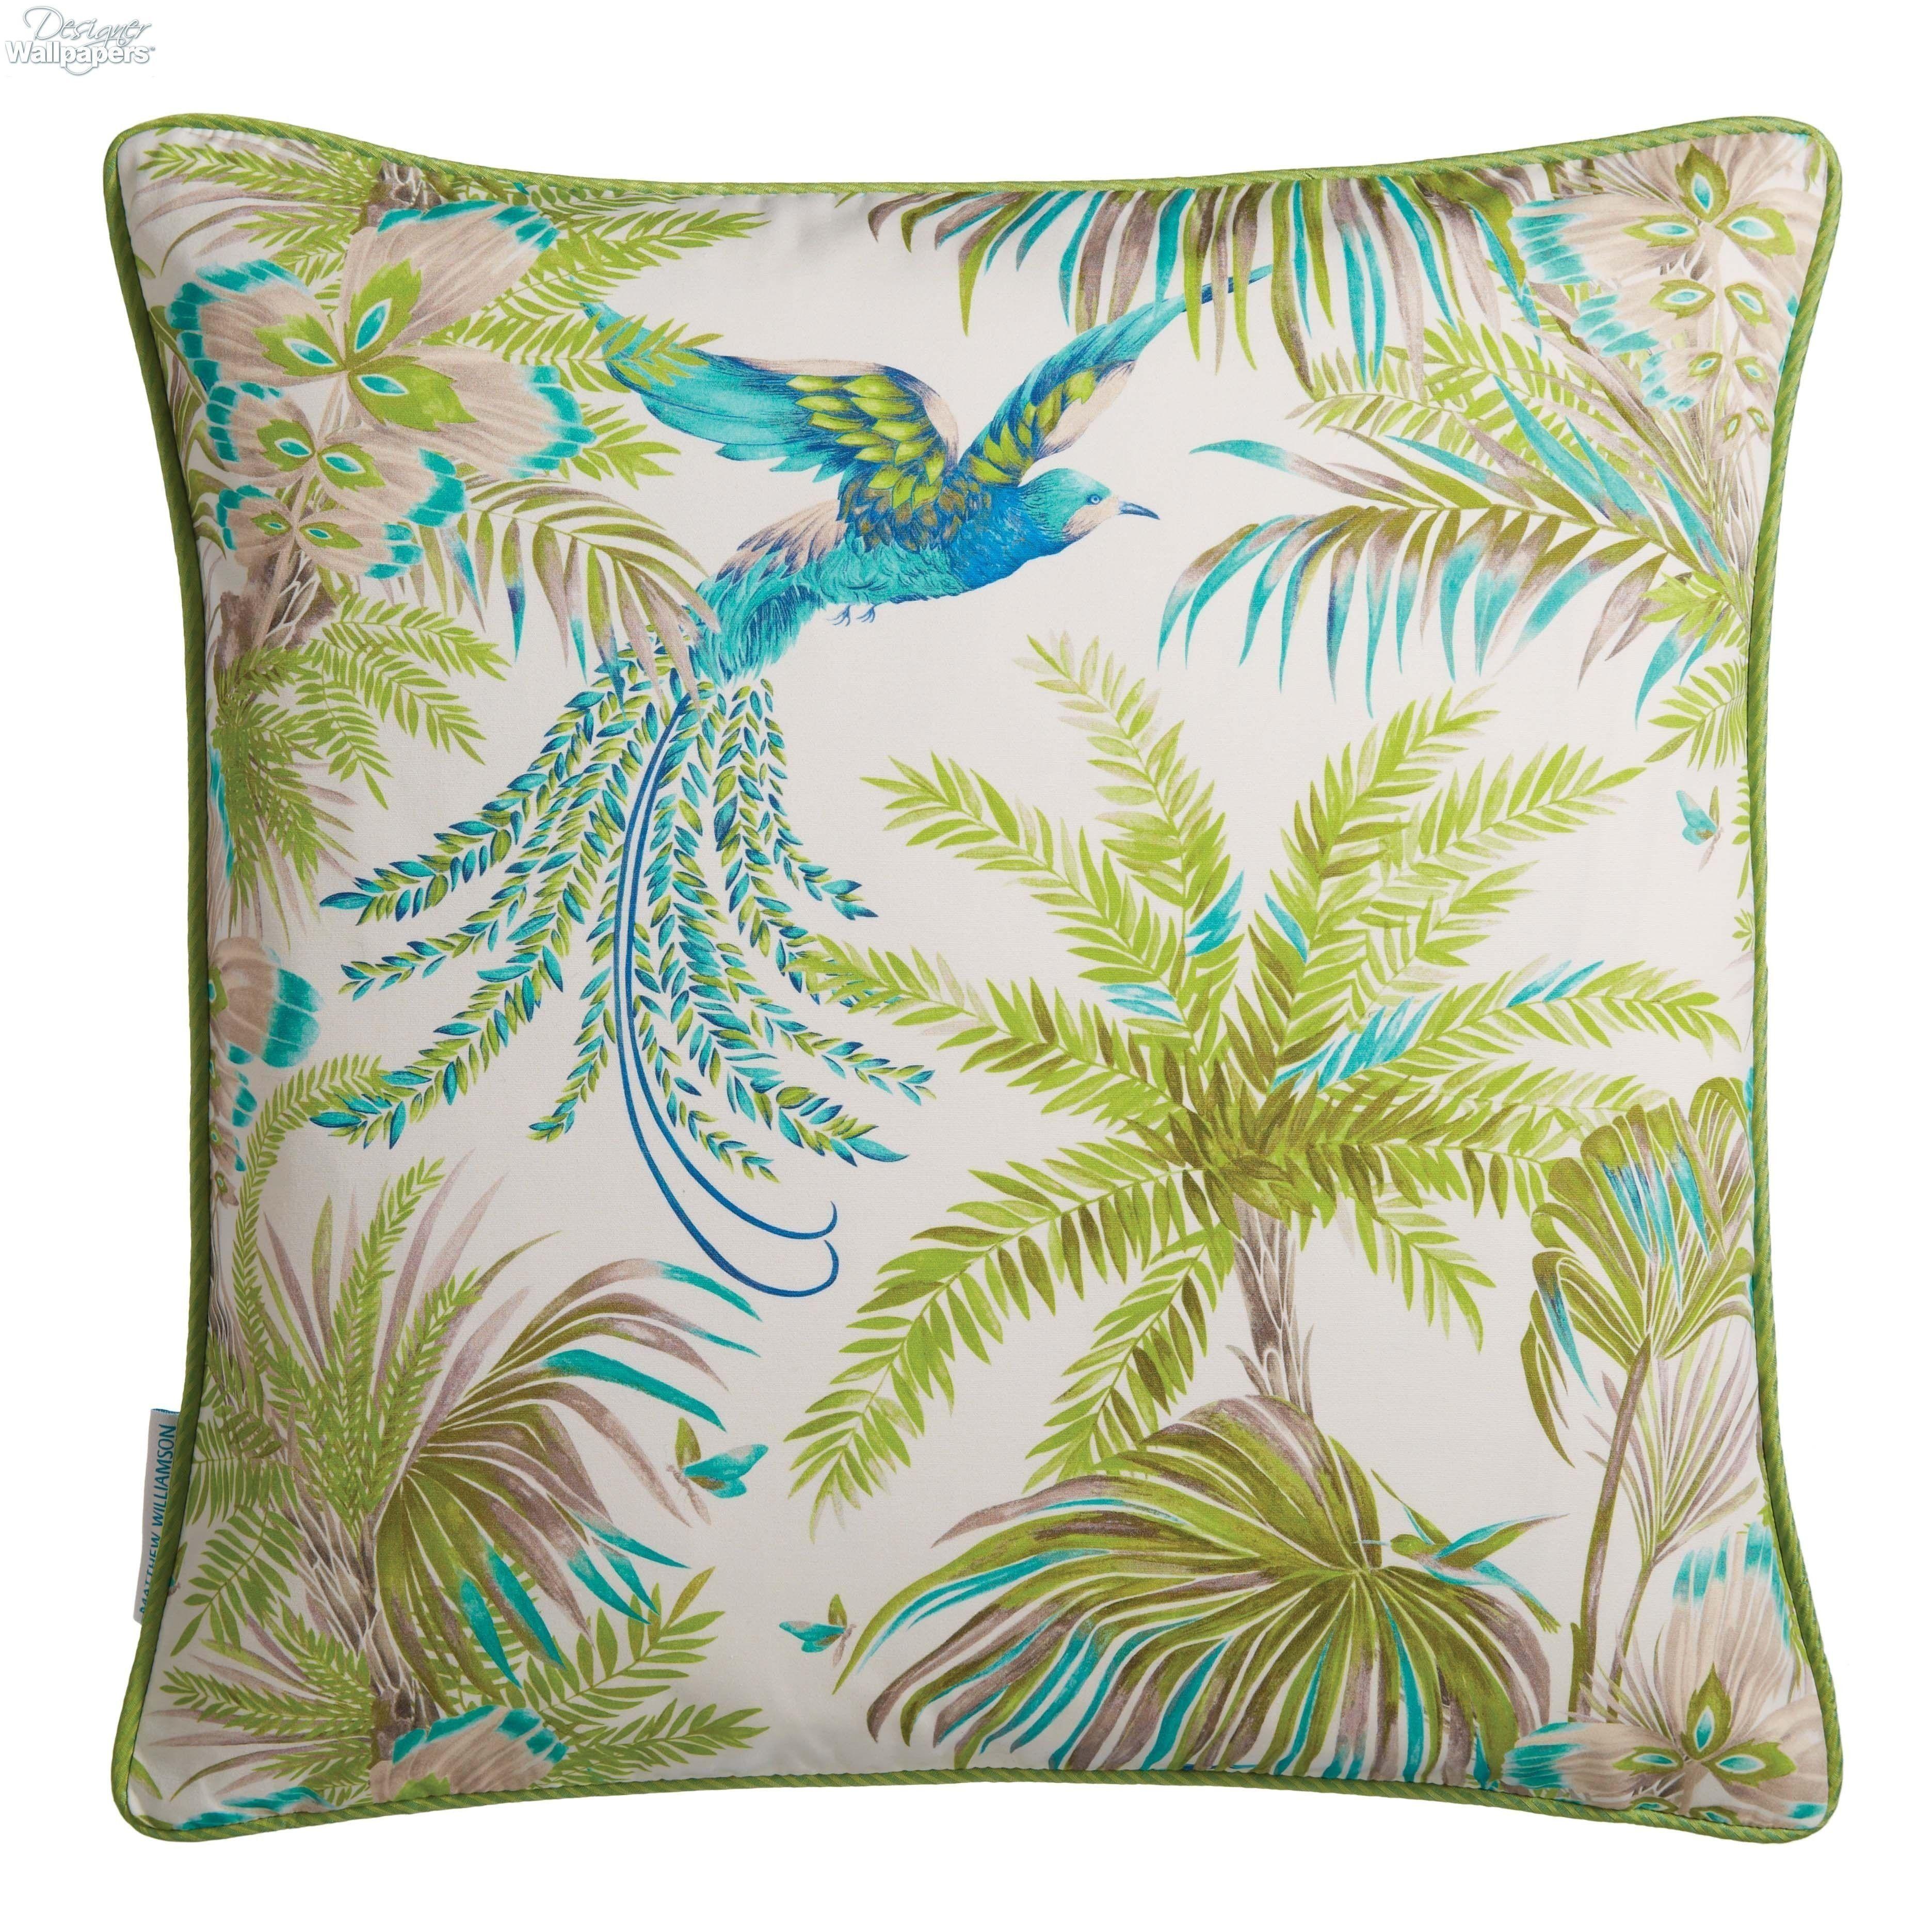 Samana Bird Of Paradise Cushion C10411 Matthew